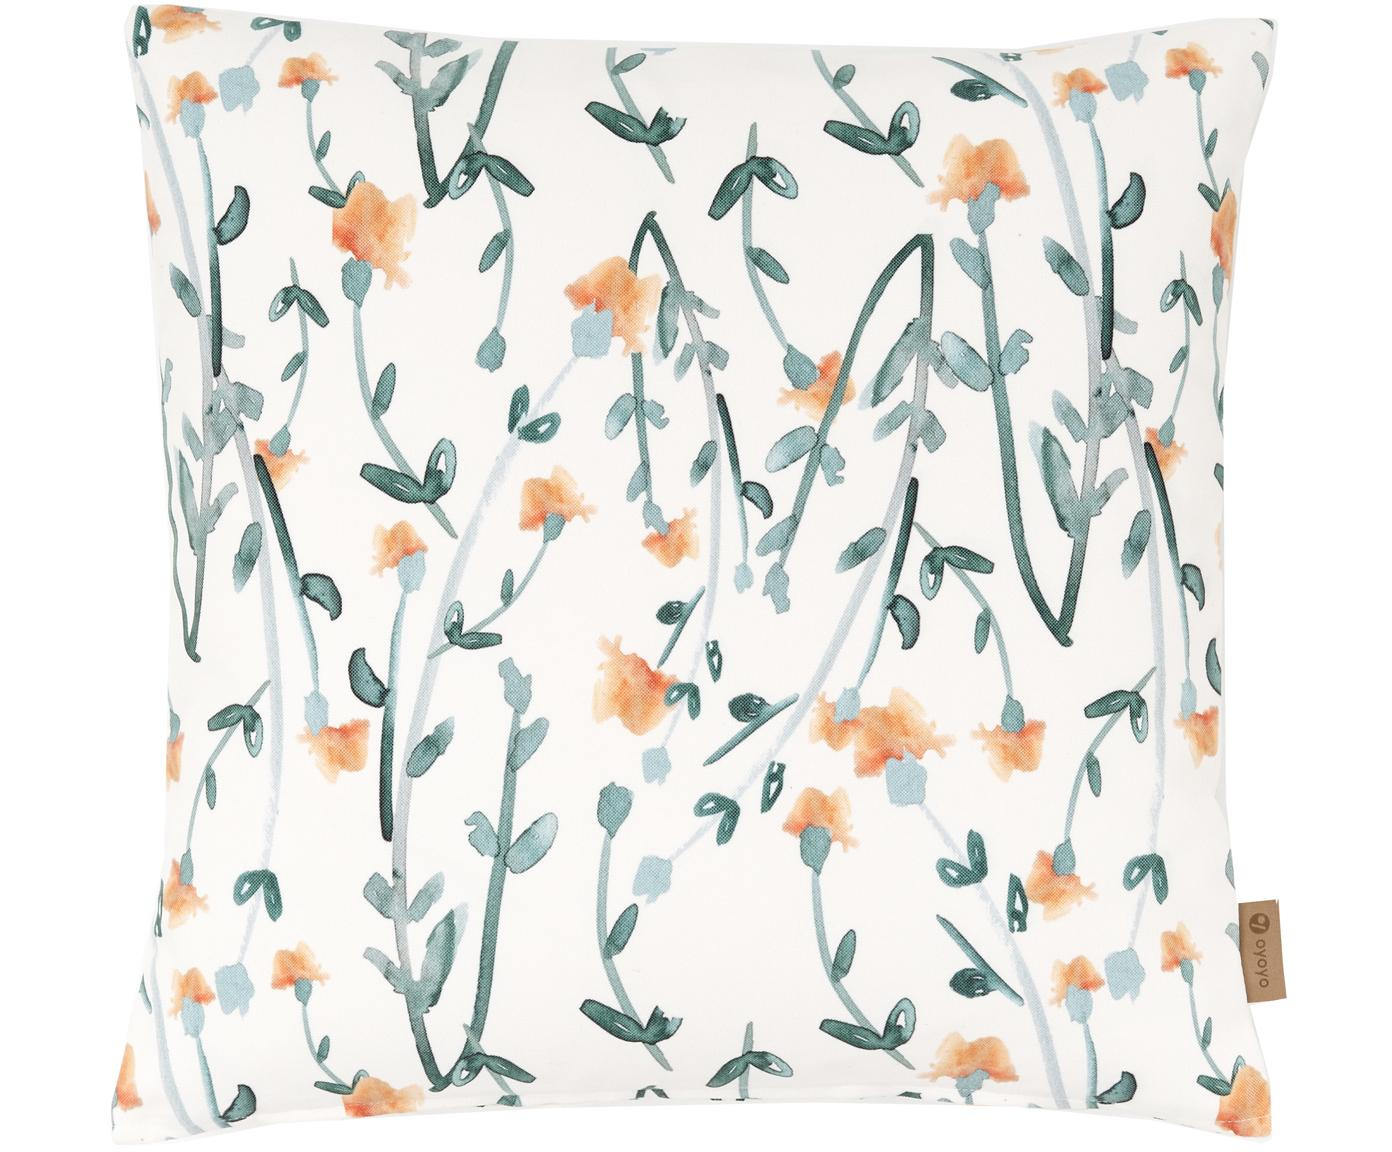 Kussenhoes Flower Dream met bloemmotief, Polyester, Wit, groen, oranje, 50 x 50 cm